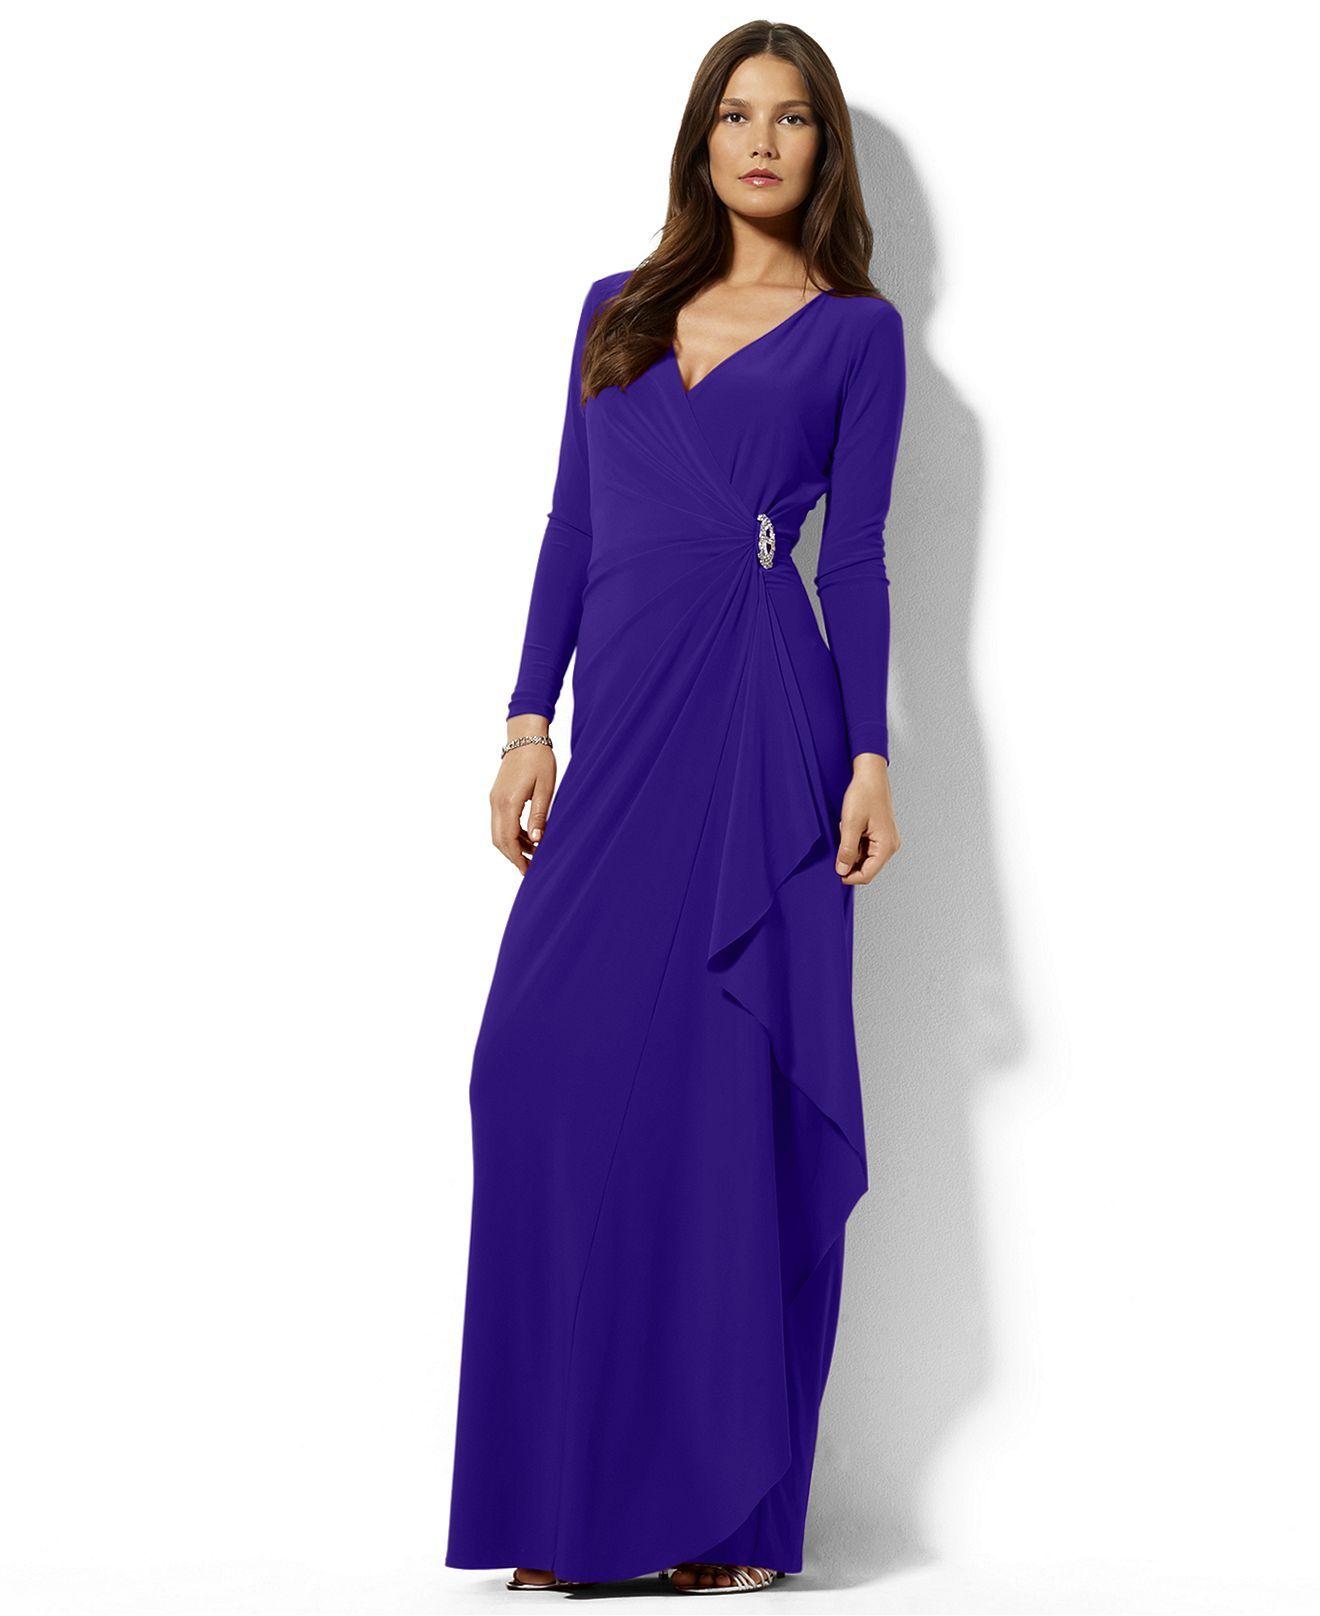 8b0220d7ea Lauren Ralph Lauren Petite Dress, Long-Sleeve Draped Jersey Gown - Womens  Petite Dresses - Macy's